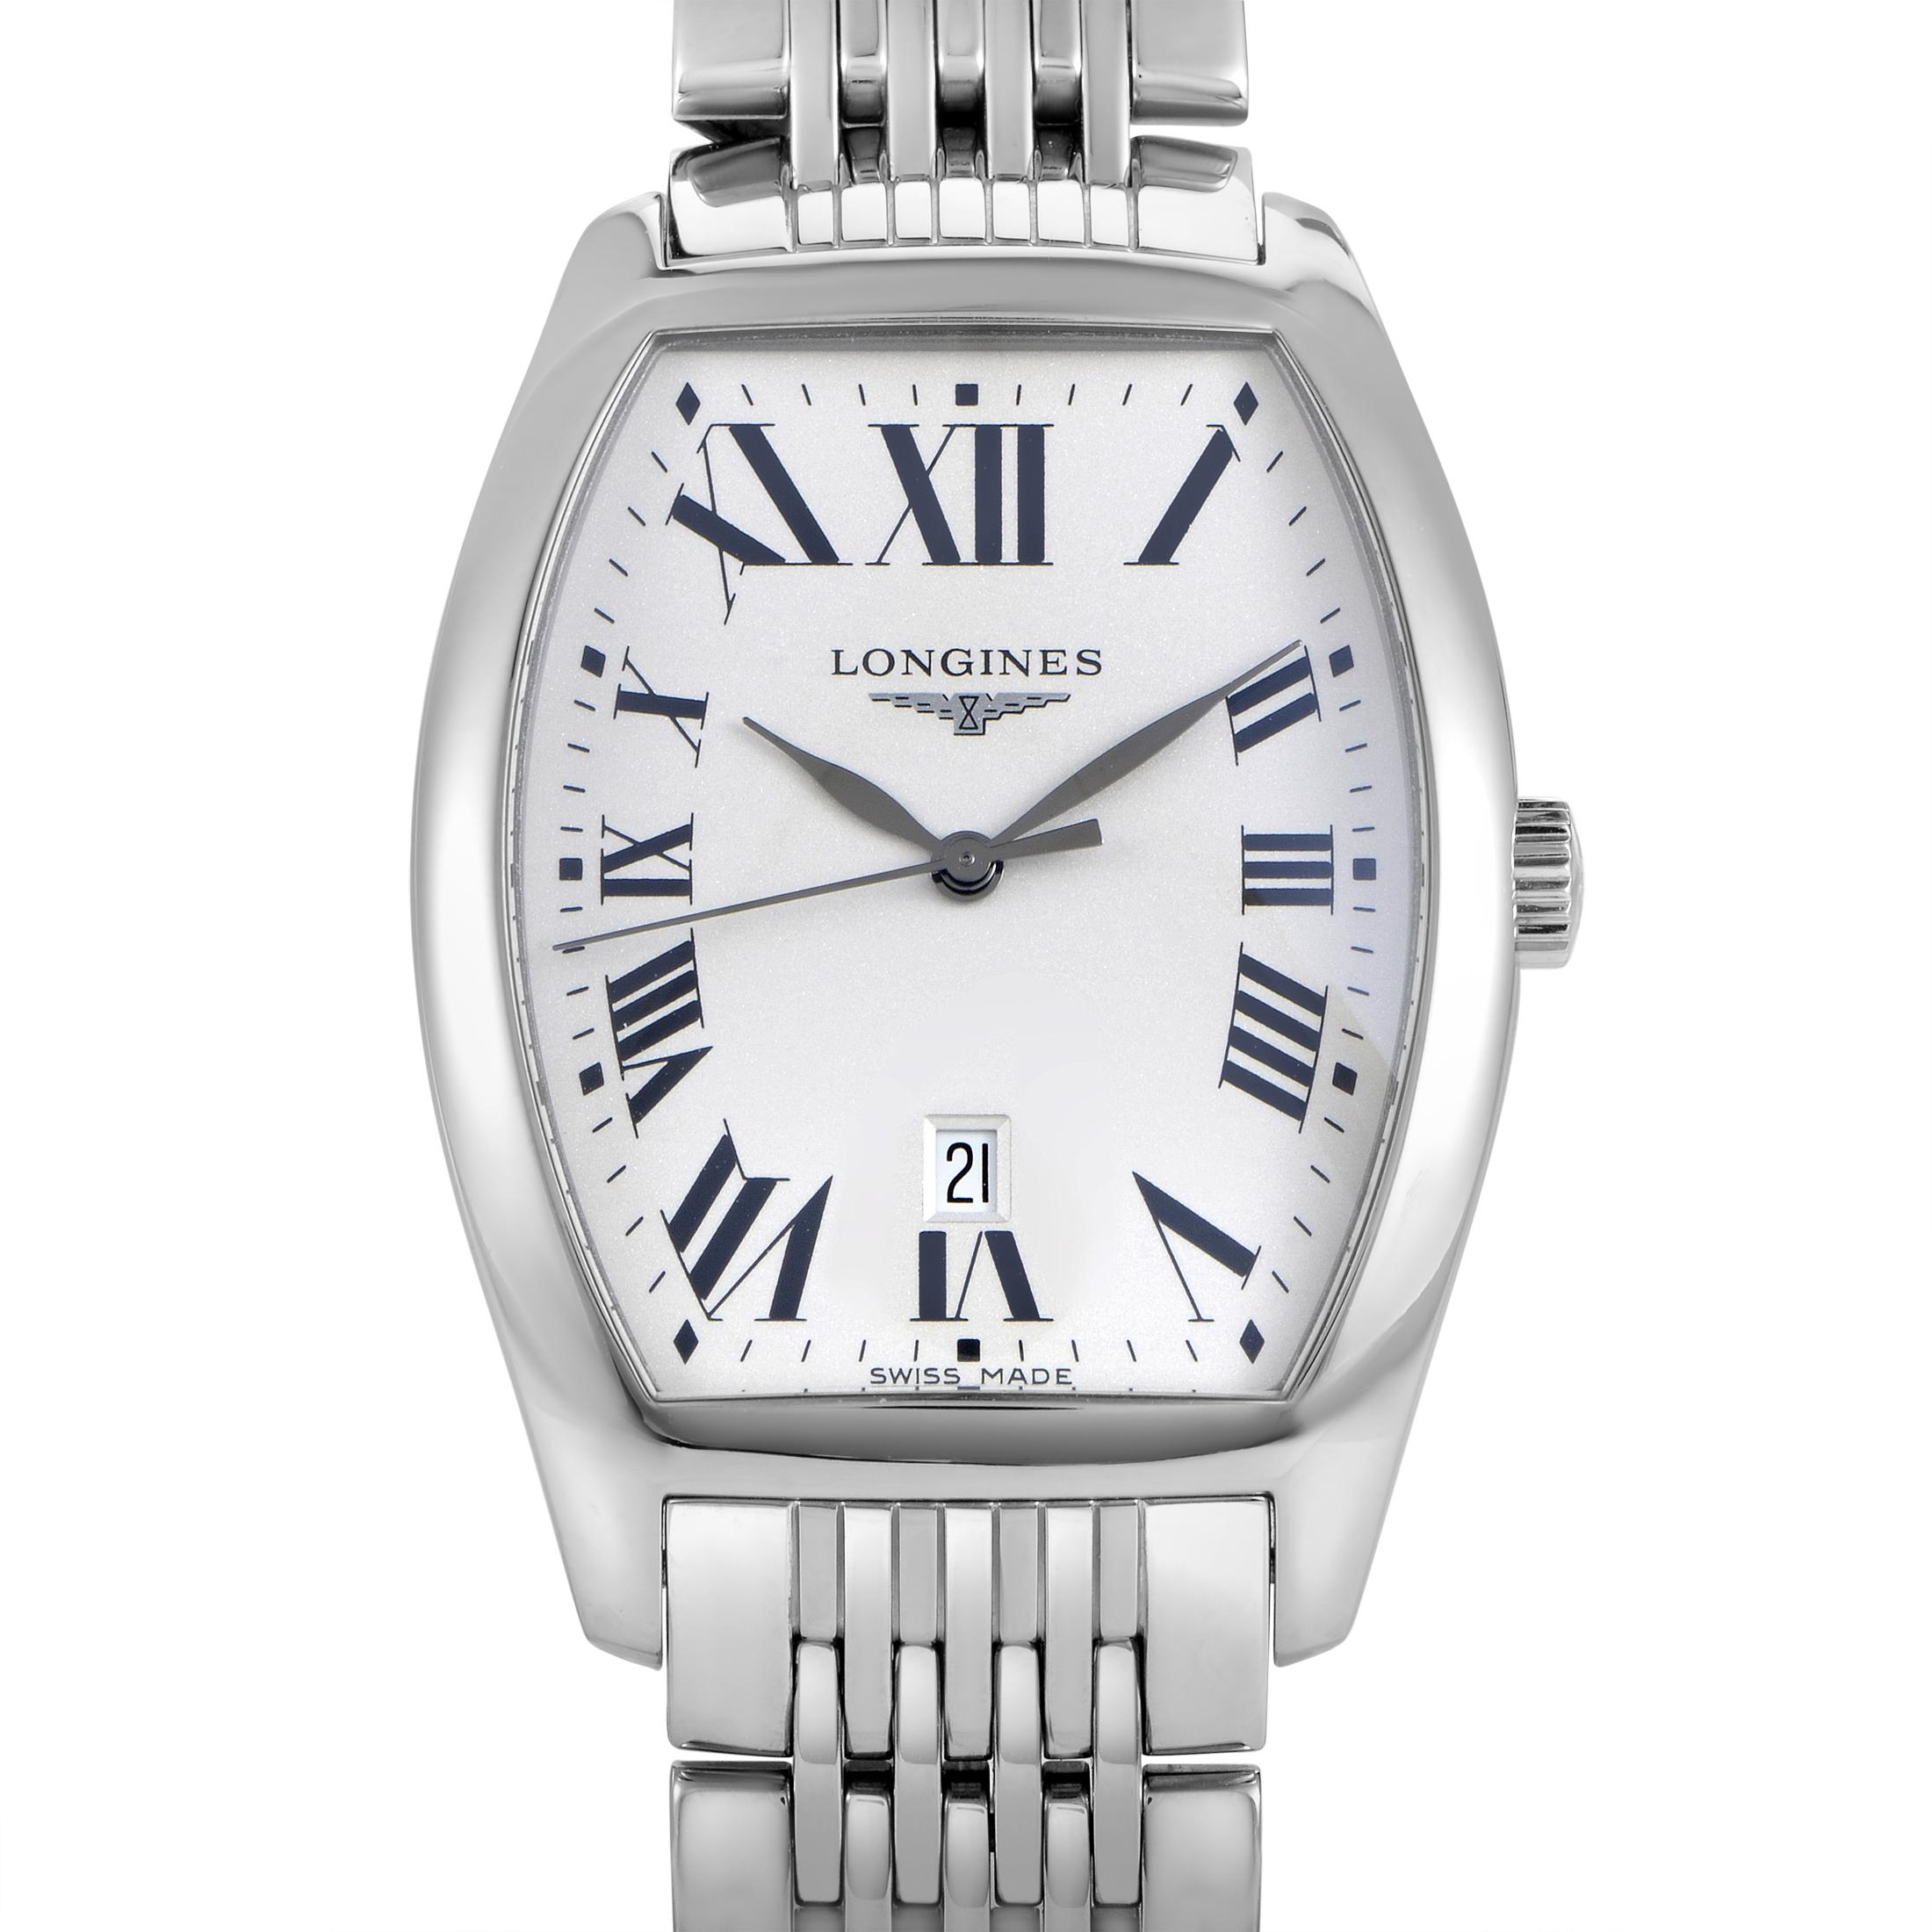 Evidenza Men's Stainless Steel Quartz Watch L2.655.4.71.6